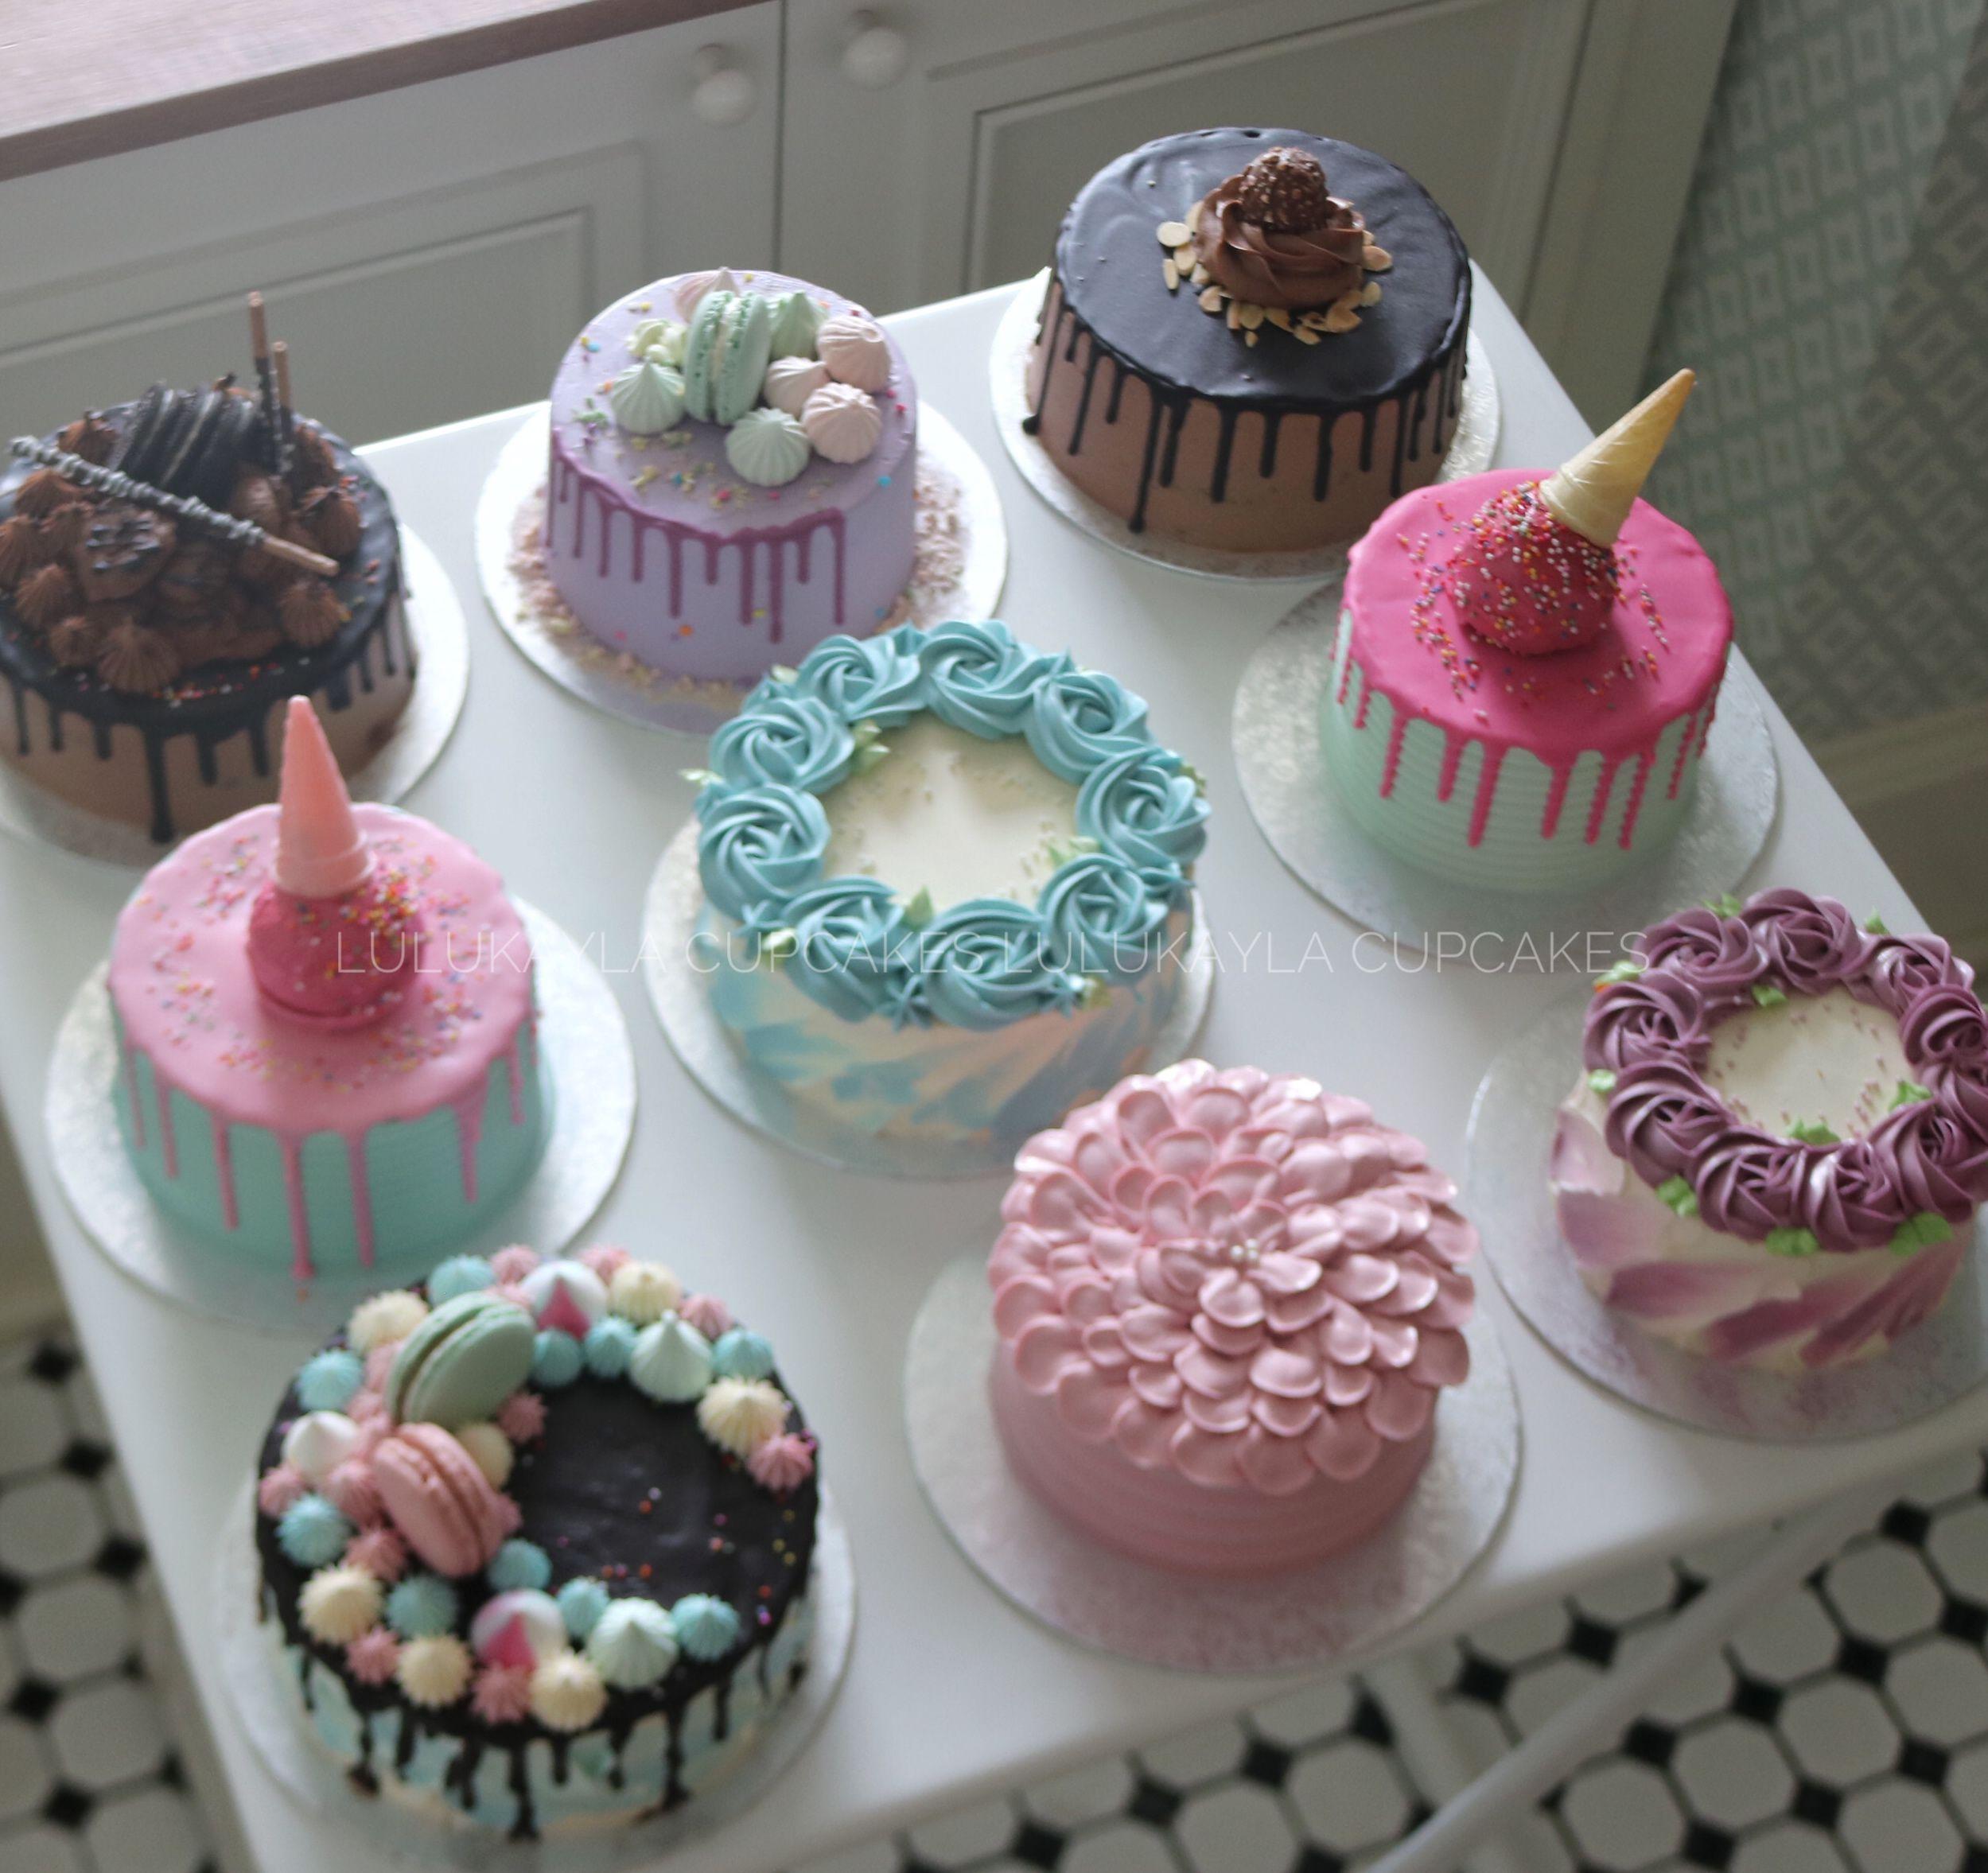 Buttercream Cake With Images Mini Cakes Birthday Cake